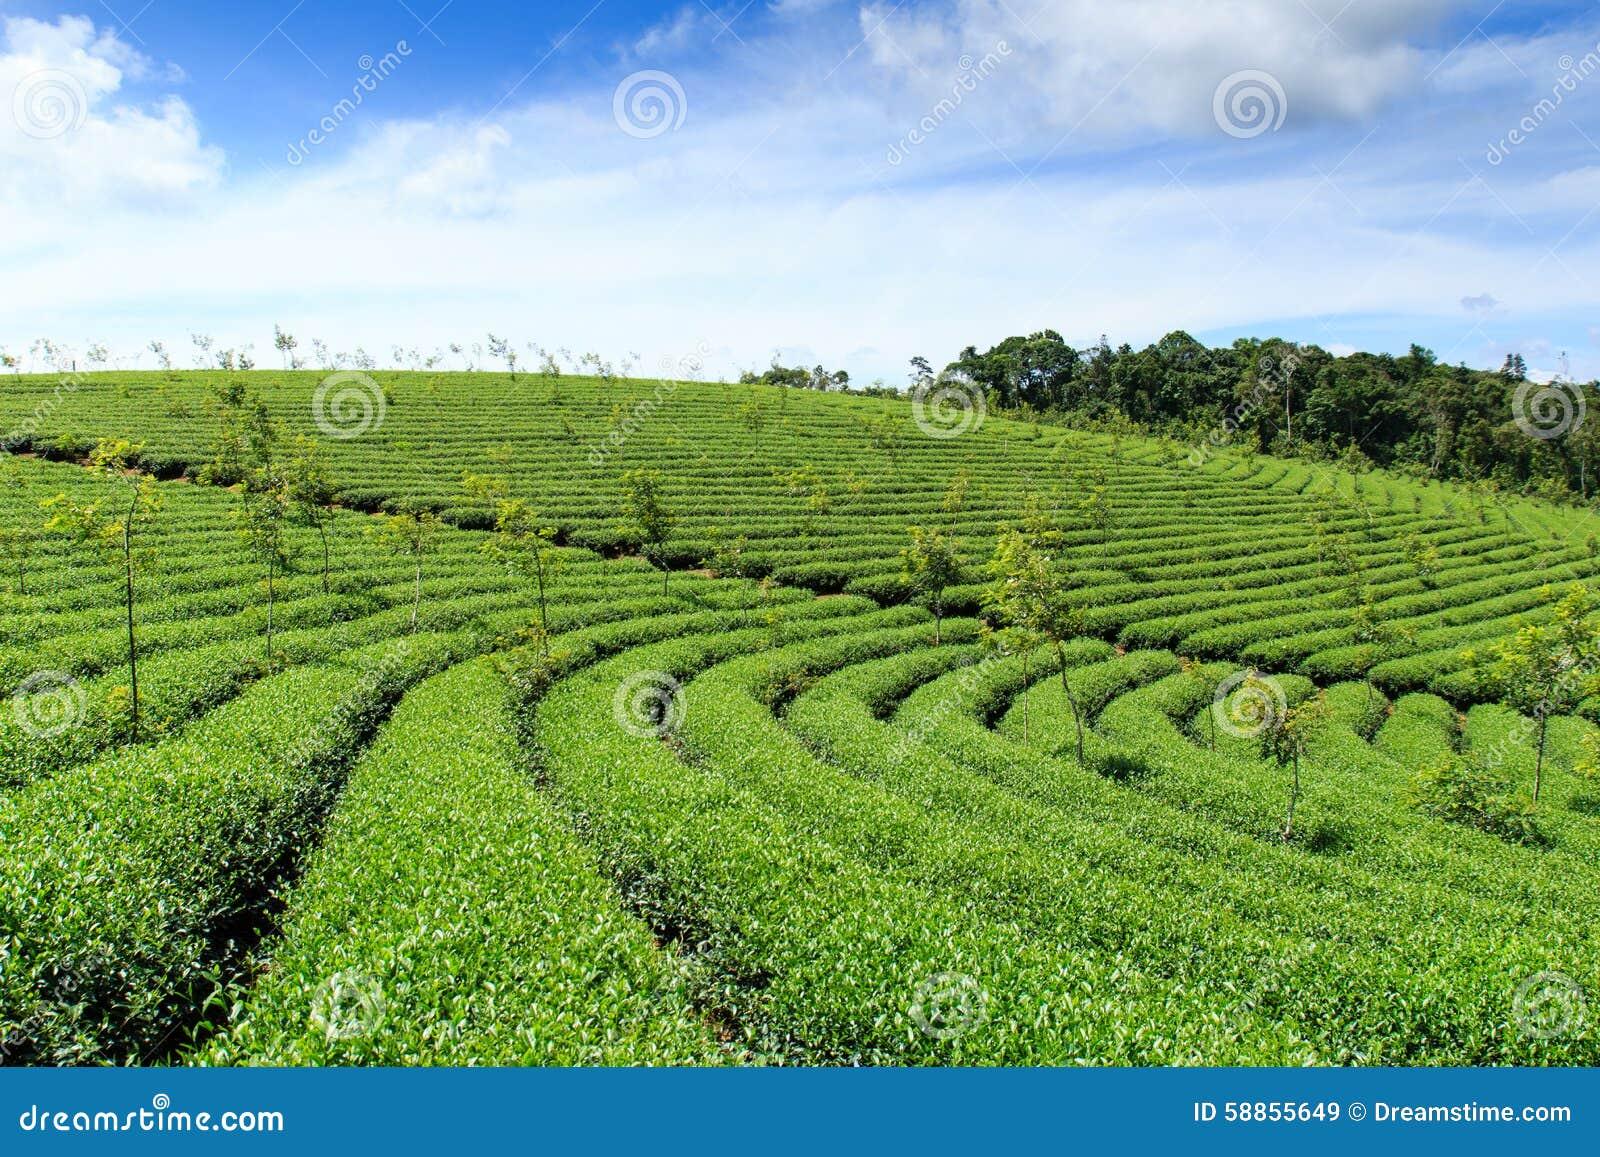 Tea farm at Bao Loc highland, Vietnam.